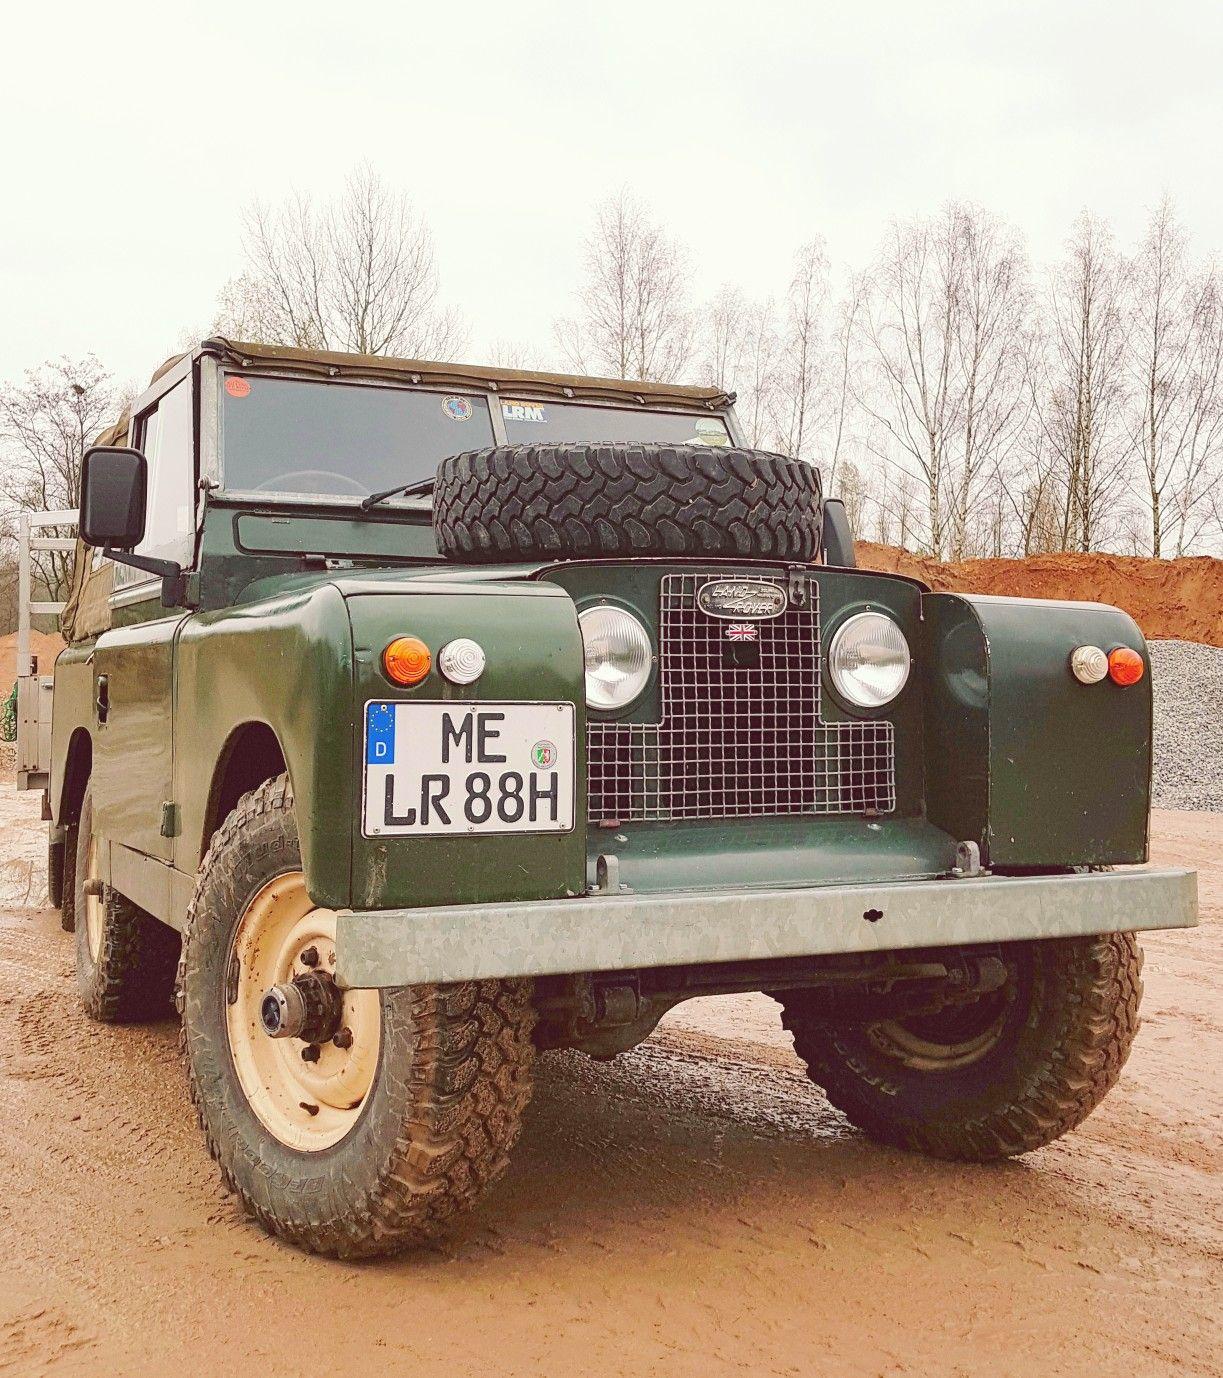 Land Rover Series 2a SWB Land rover series, Land rover